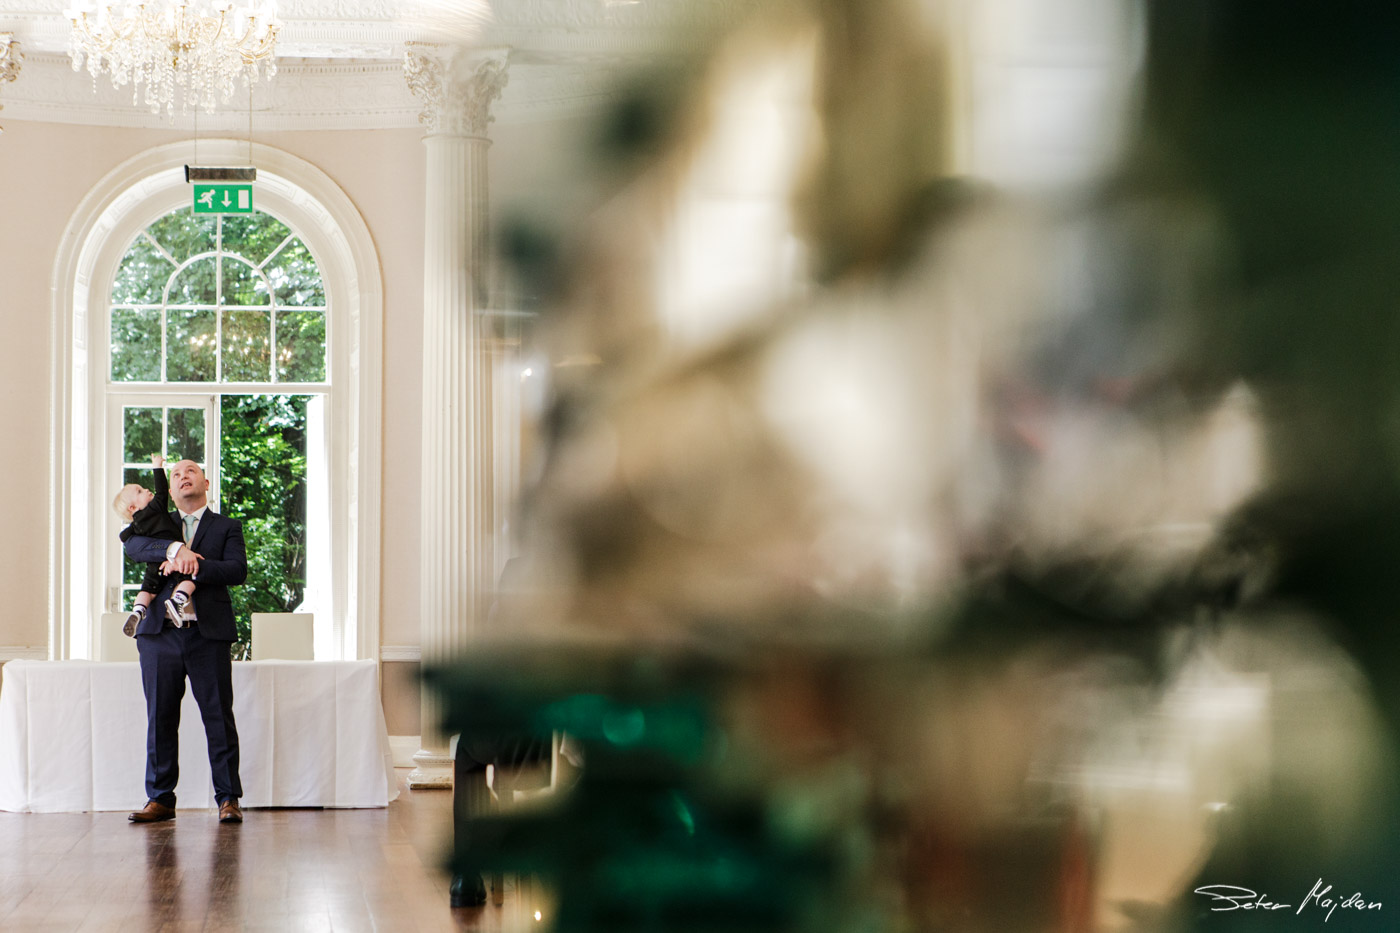 Colwick-hall-wedding-photography-14.jpg